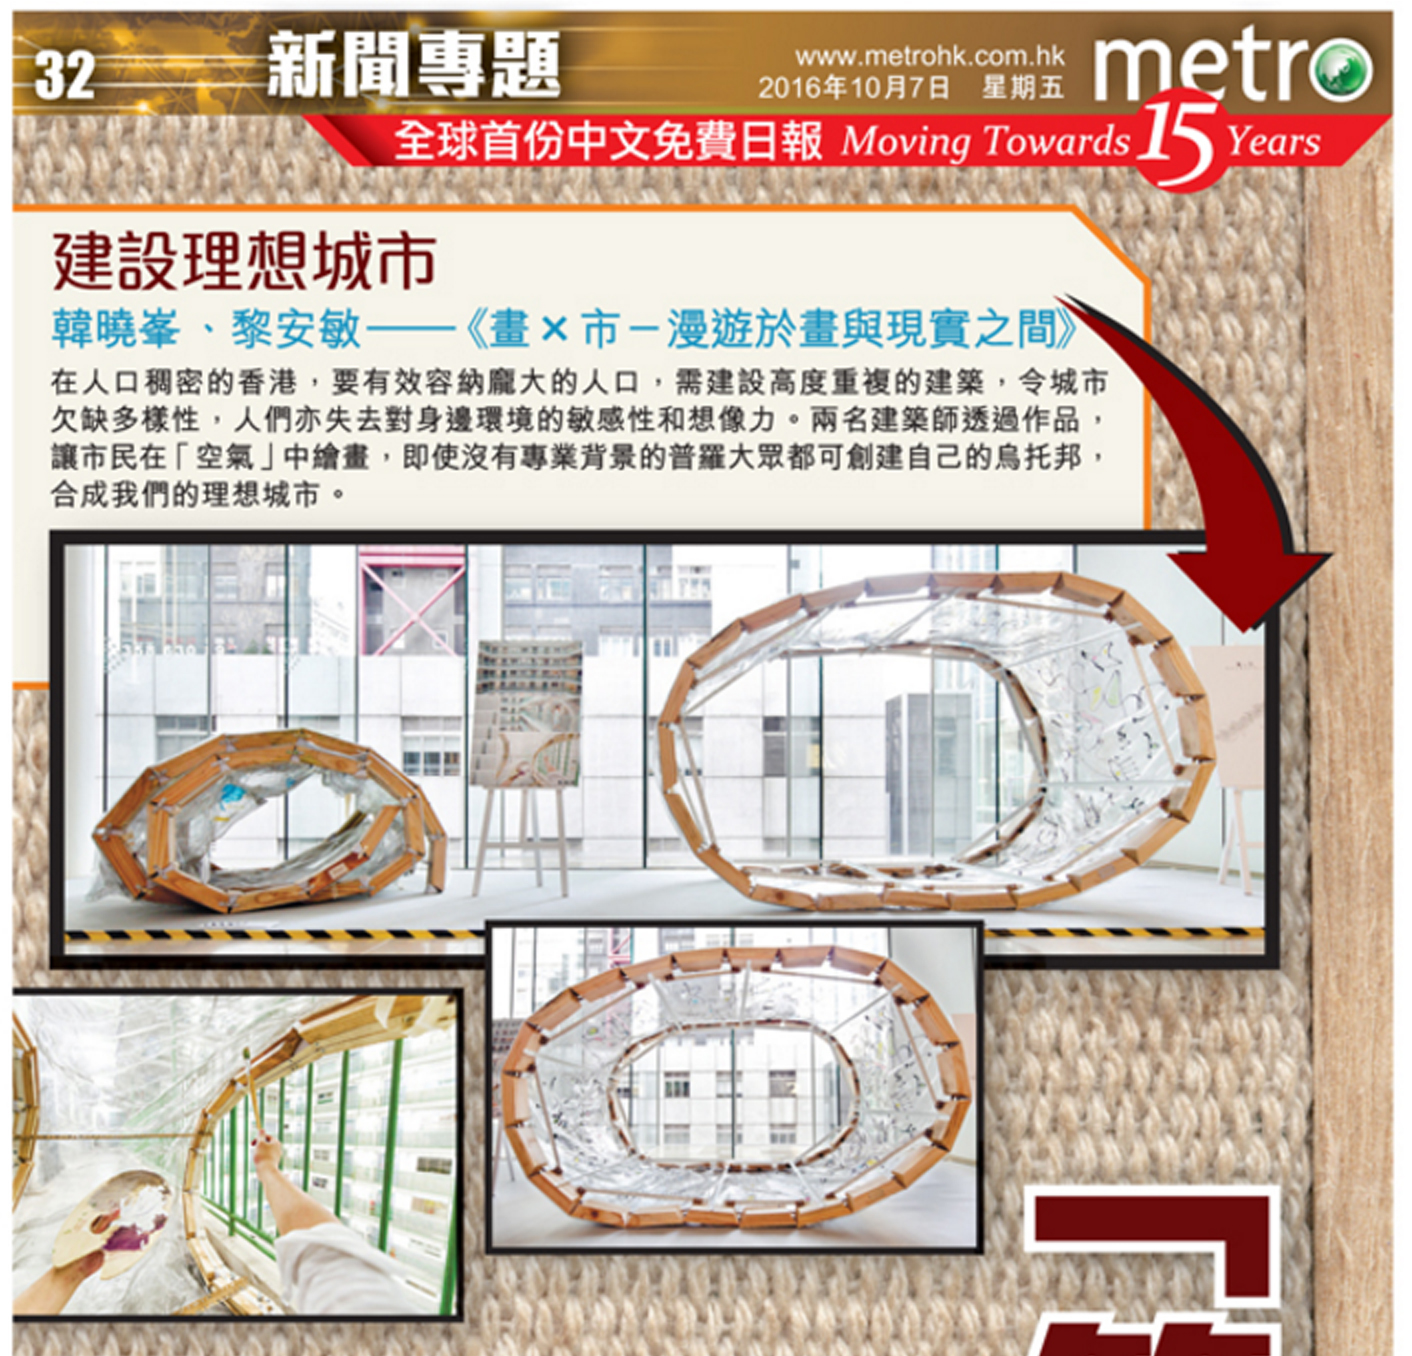 Metro News on 2016.10.7